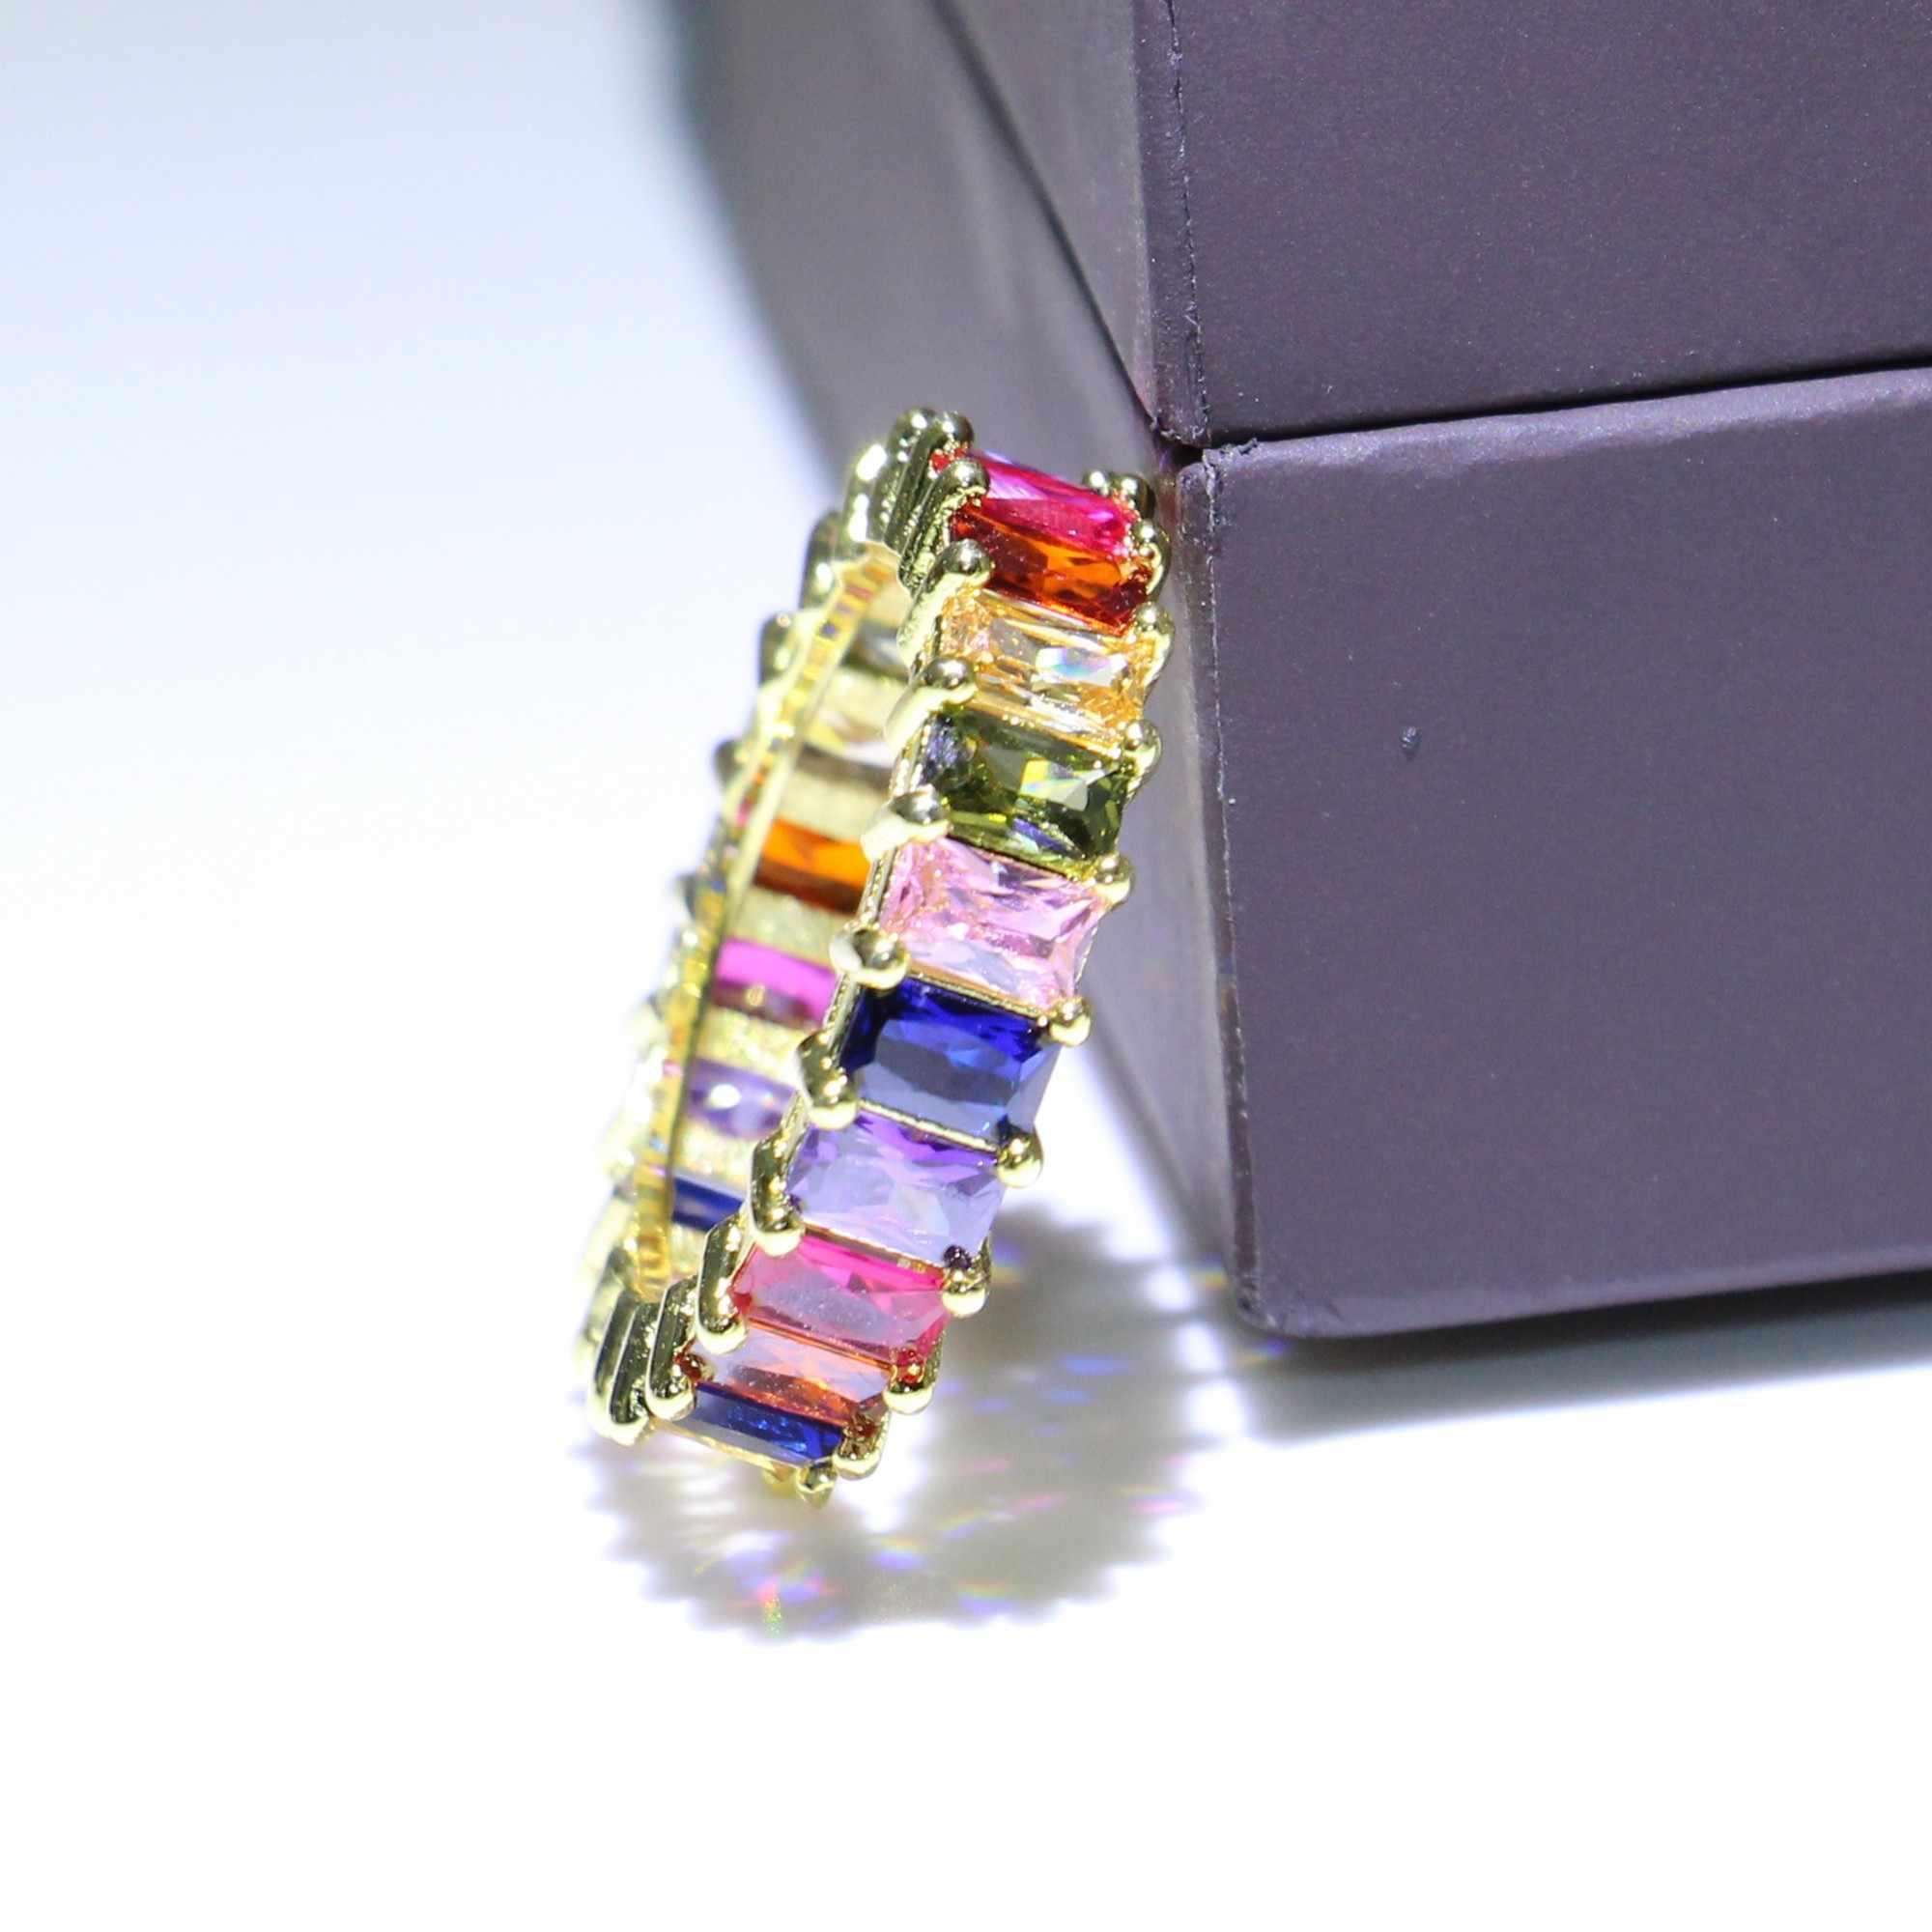 Rulalei ที่ไม่ซ้ำกันแฟชั่นเครื่องประดับ 925 Silver & Gold เติม 5A Cubic Zirconia แหวน Full CZ งานแต่งงานแหวนสำหรับสตรี